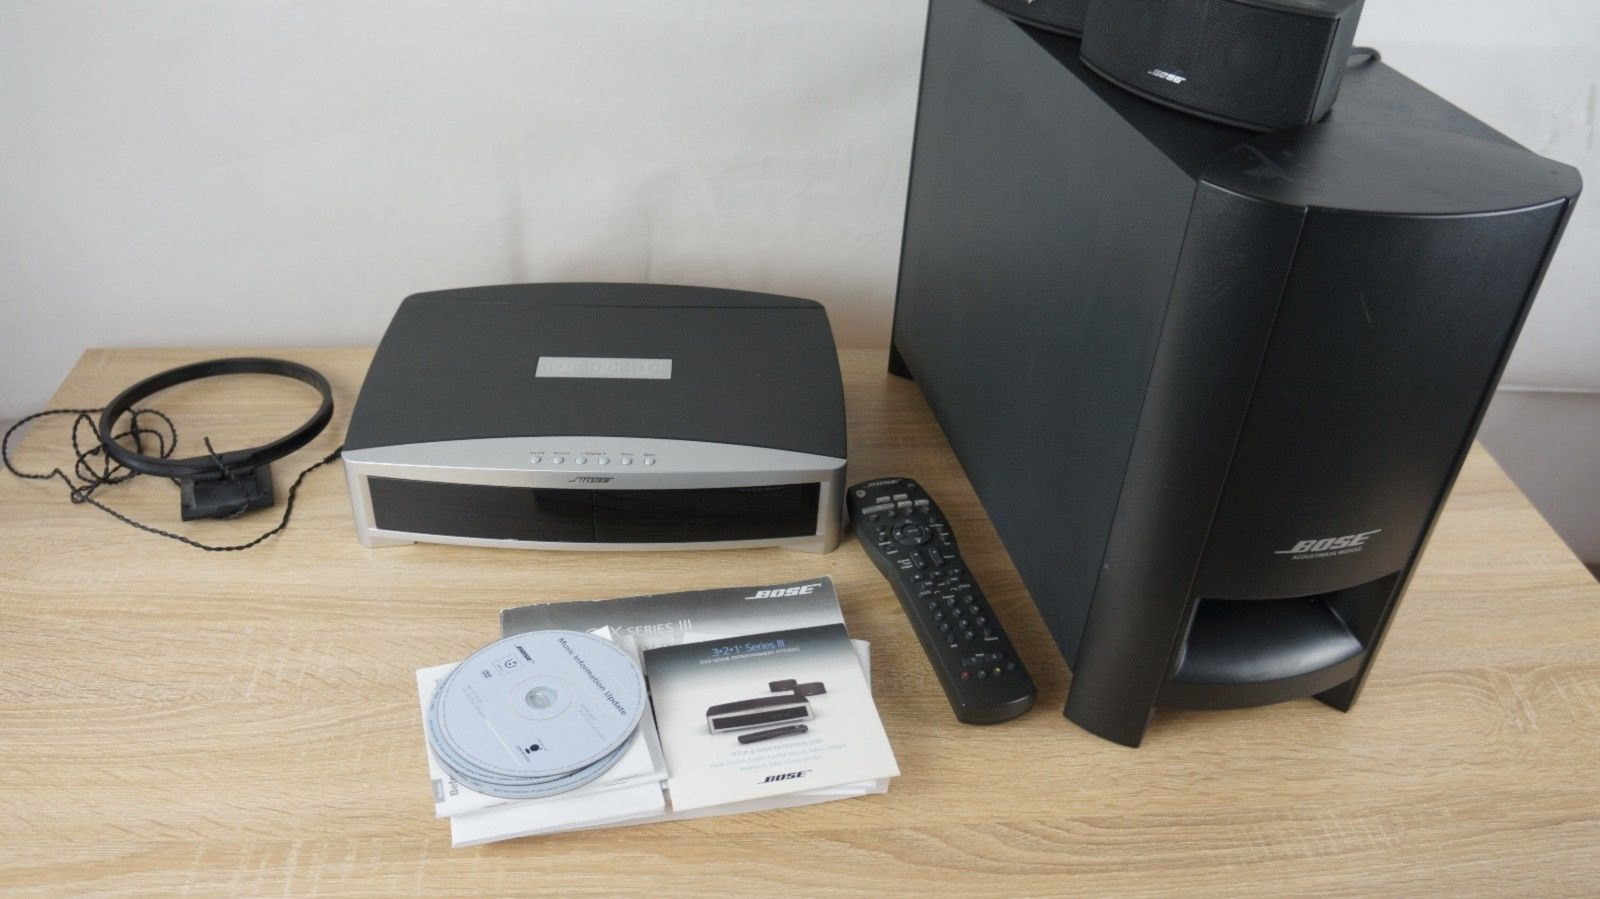 bose 321 3 2 1 gsx series iii heimkino system mit. Black Bedroom Furniture Sets. Home Design Ideas